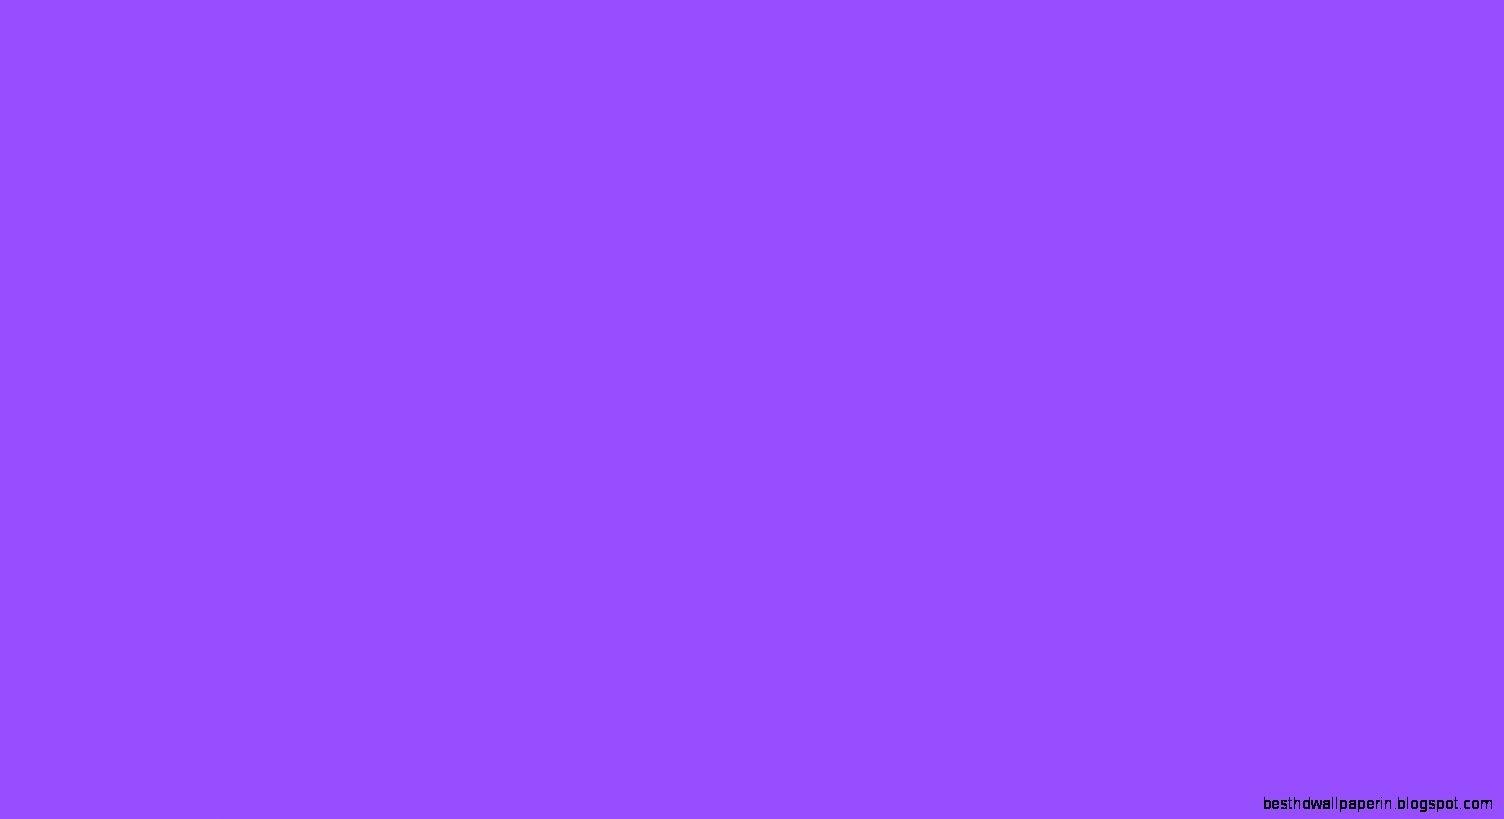 Plain Light Purple Color Wallpaper | Best HD Wallpapers